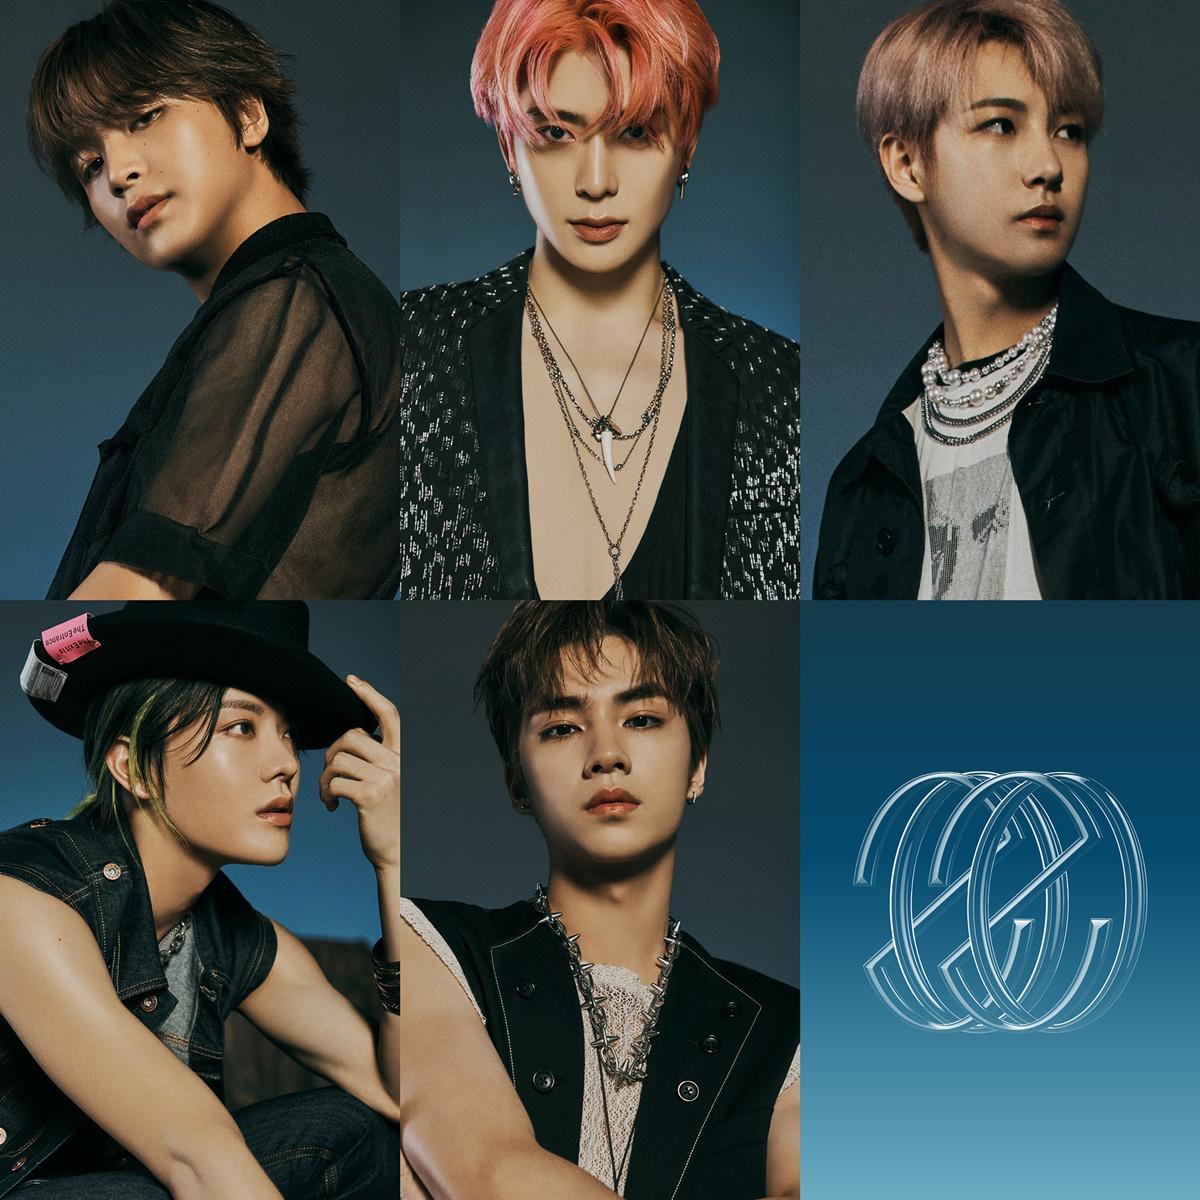 Image 1 [NCT – The 2nd Album RESONANCE Pt.1]  แถวบน (HAECHAN, JAEHYUN, RENJUN) แถวล่าง (YUTA, XIAOJUN)